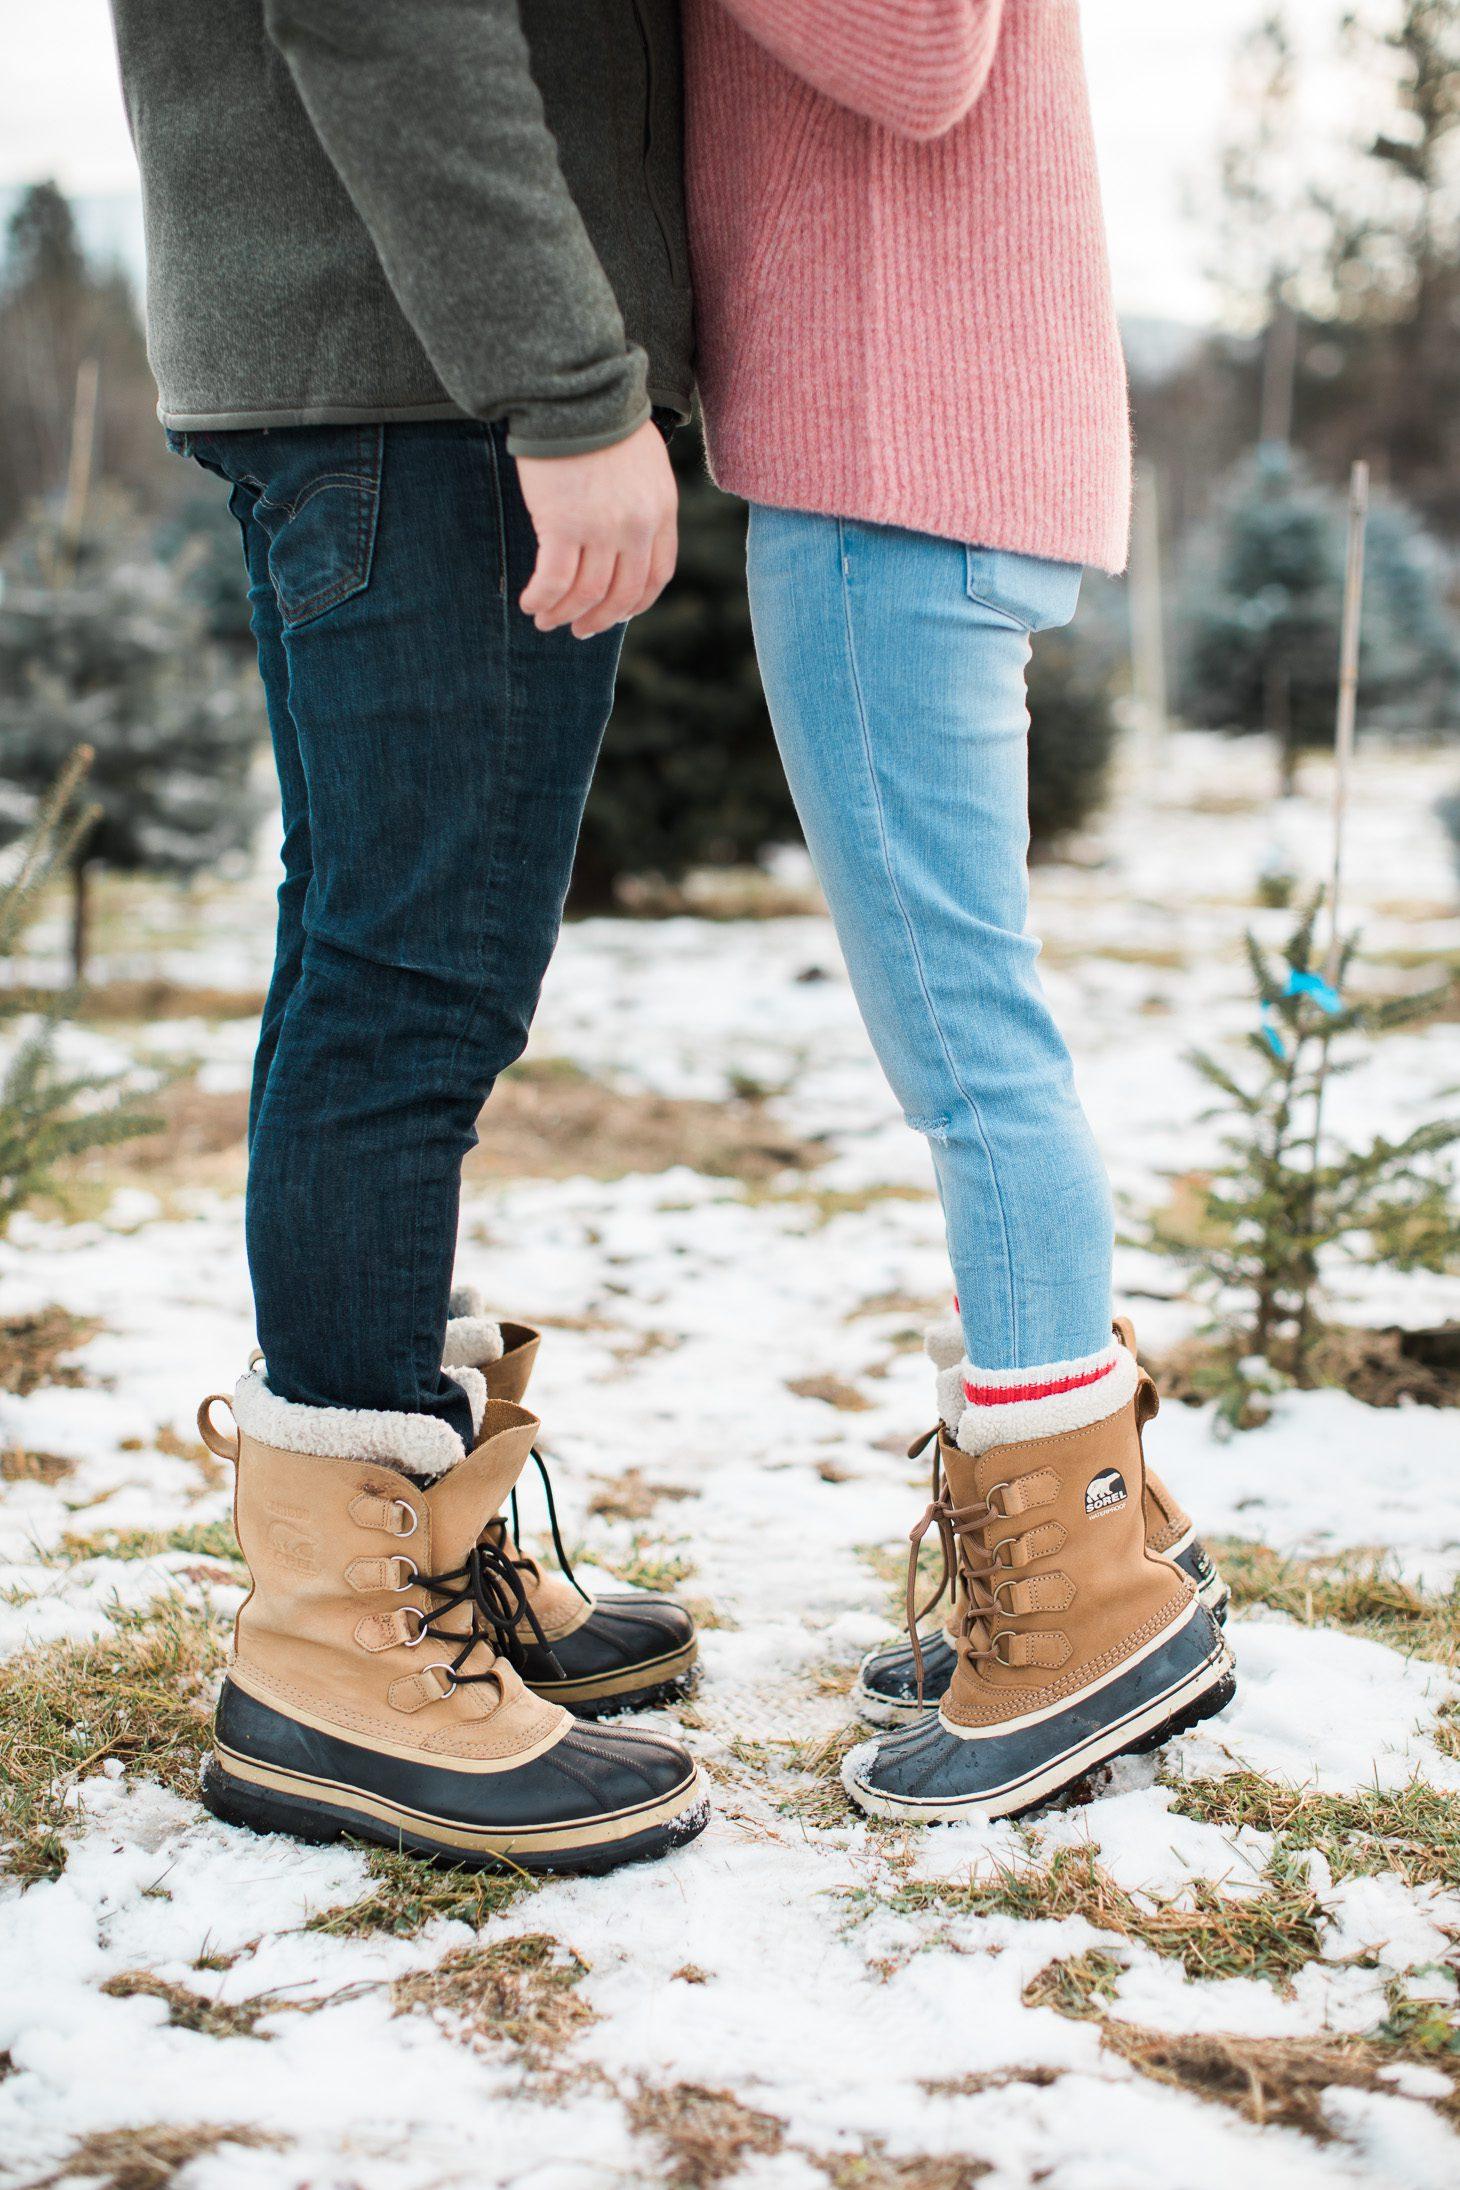 Jillian Harris Nordstrom Sorel Boots